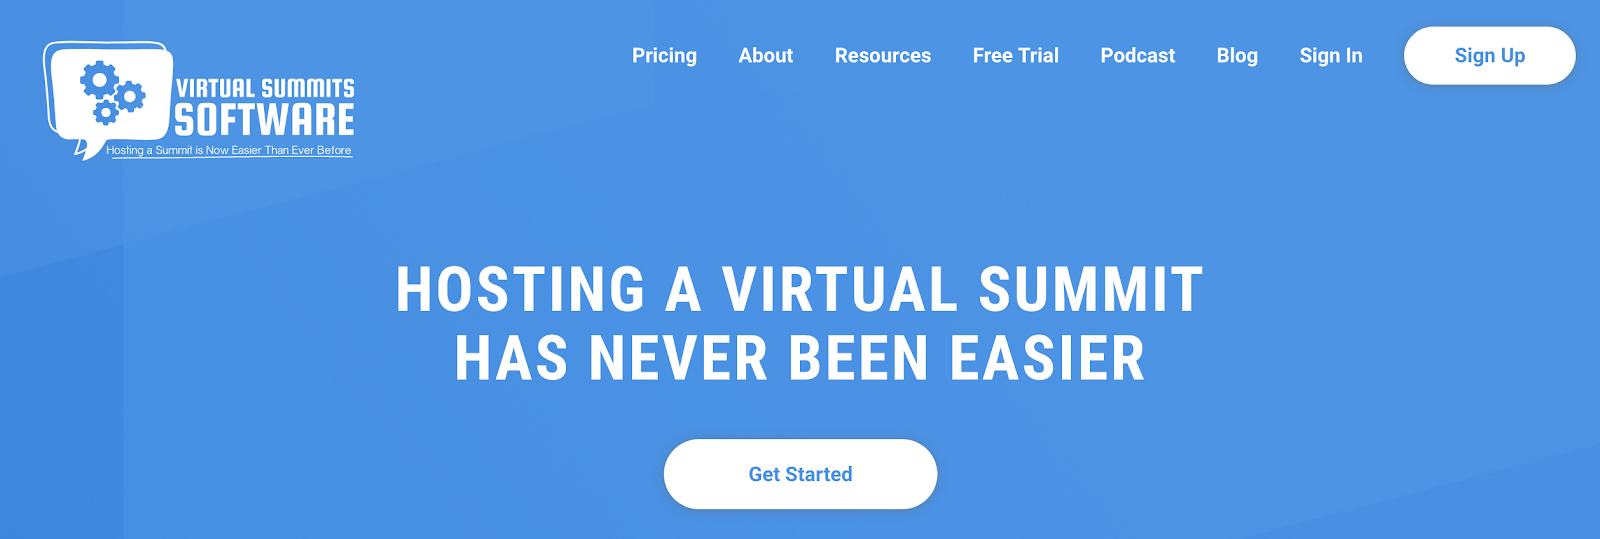 Virtual Summits Software - Tech Influencer Program